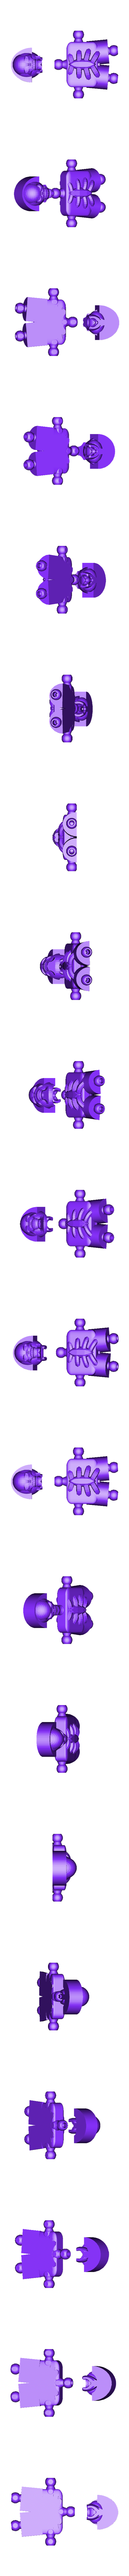 Klicket_Boney_-_head_body.stl Download free STL file Klicket v4 - Boney • 3D printer template, gotbits